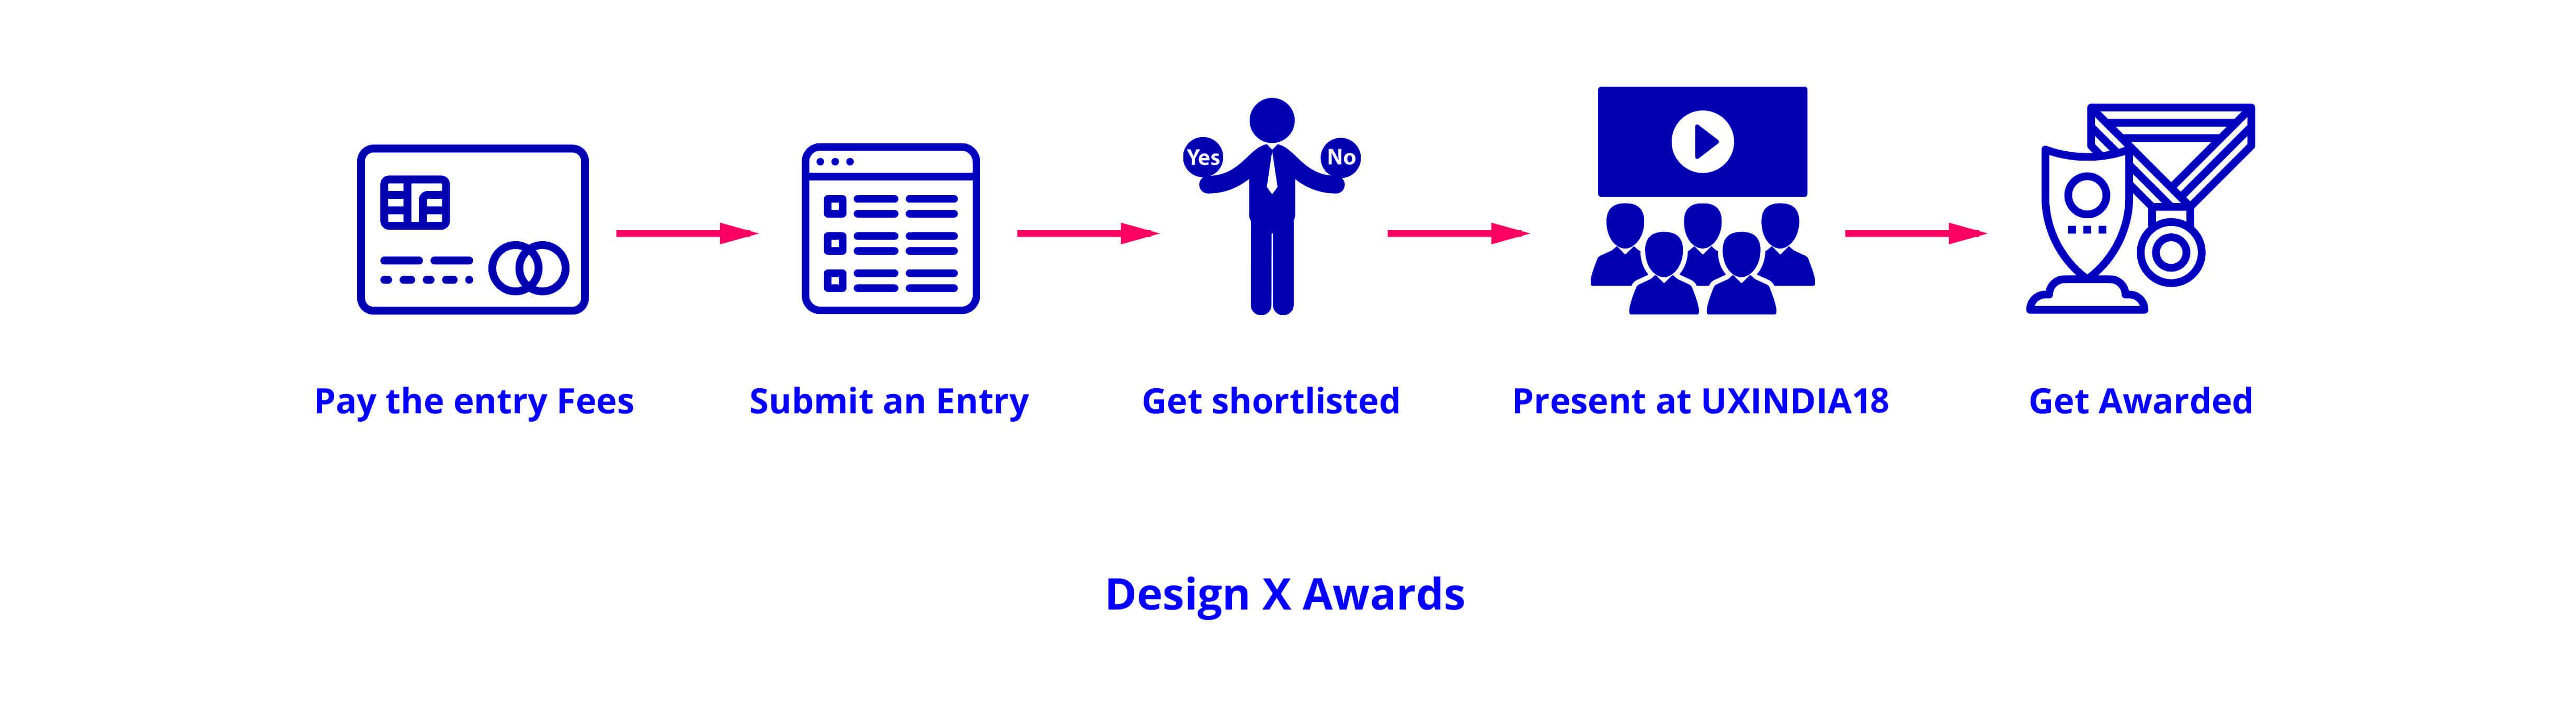 Design X Awards